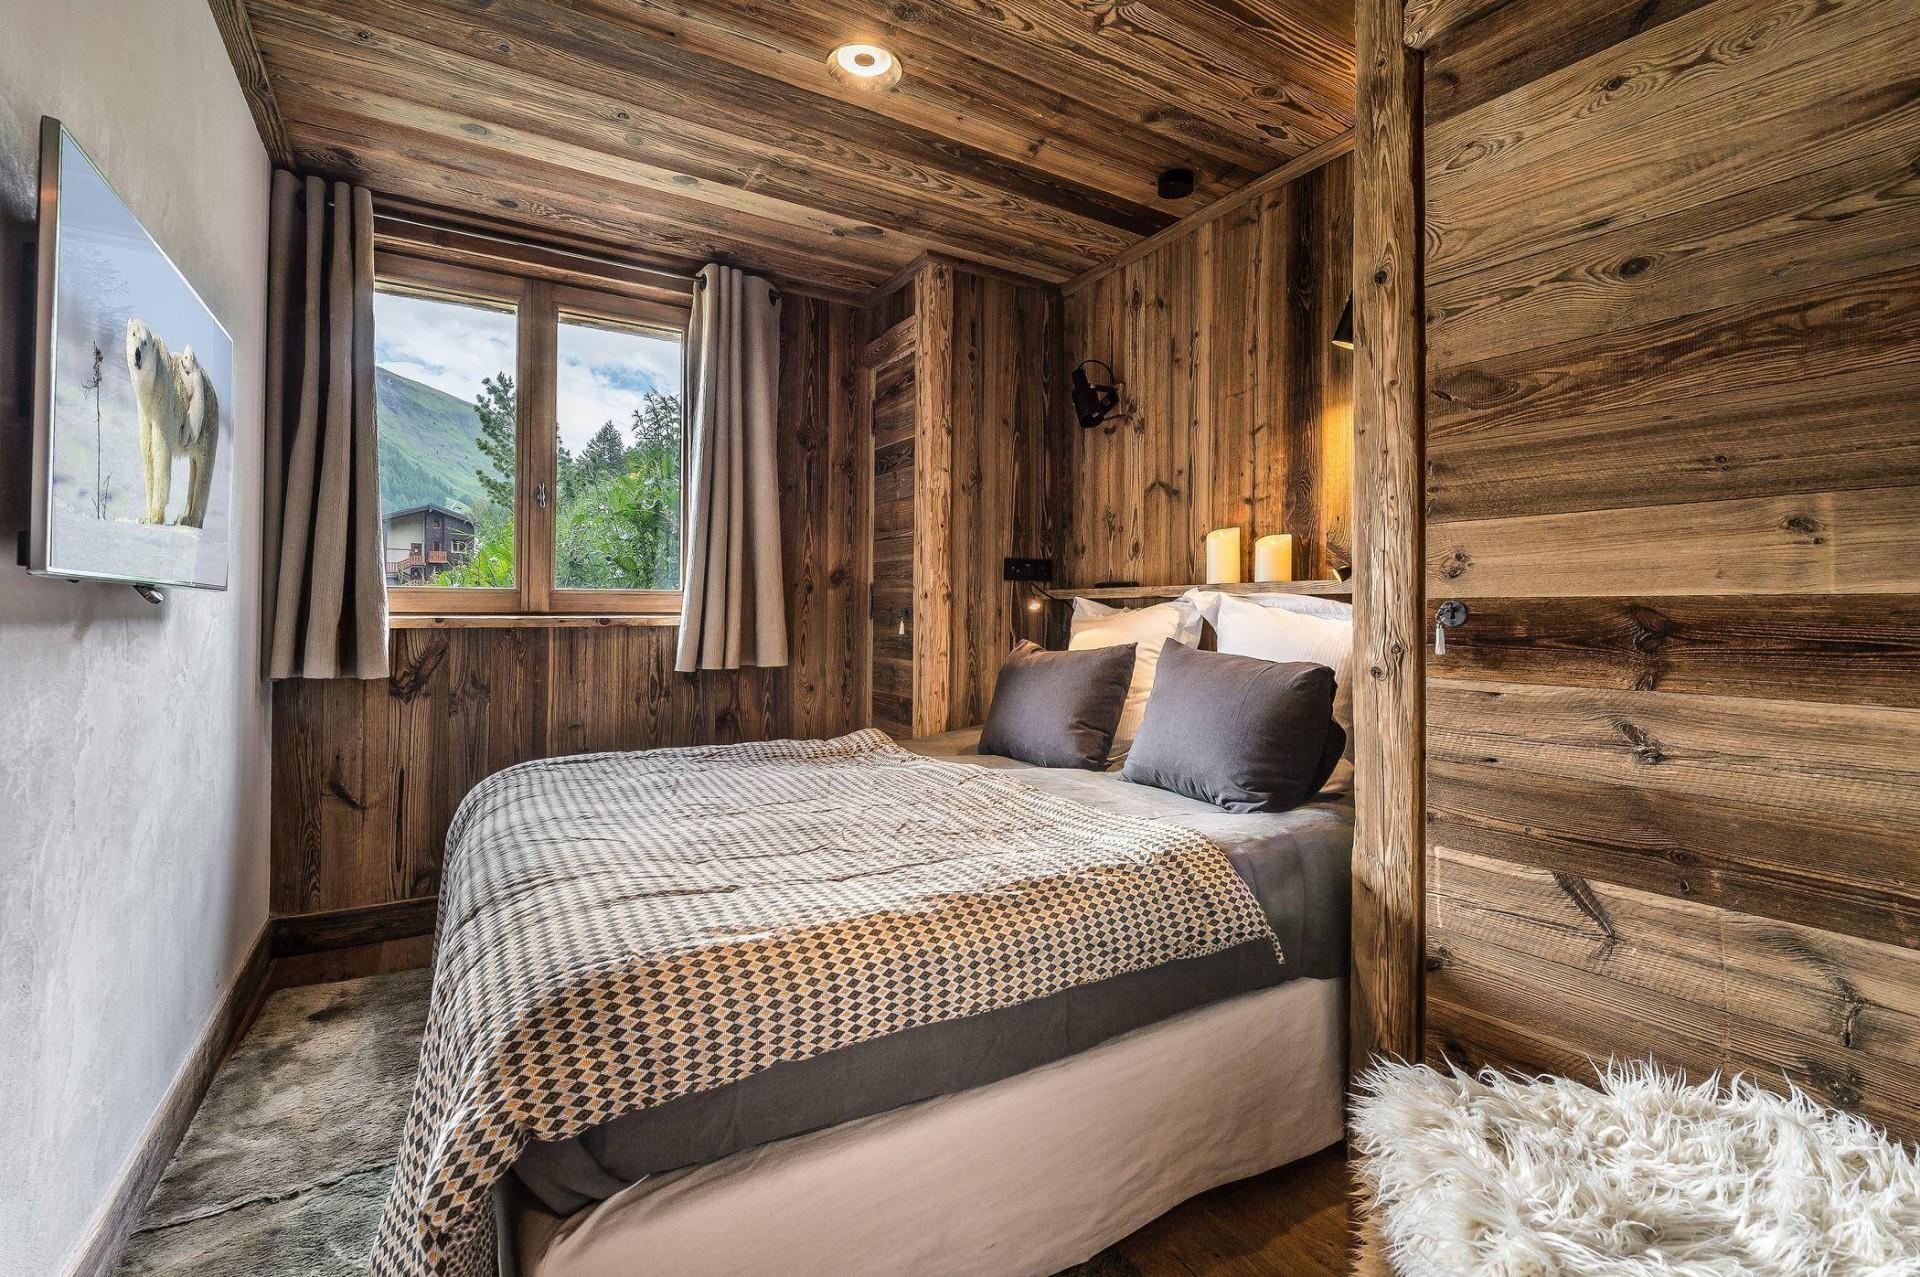 Val d'Isère Location Chalet Luxe Uralelite Chambre 4